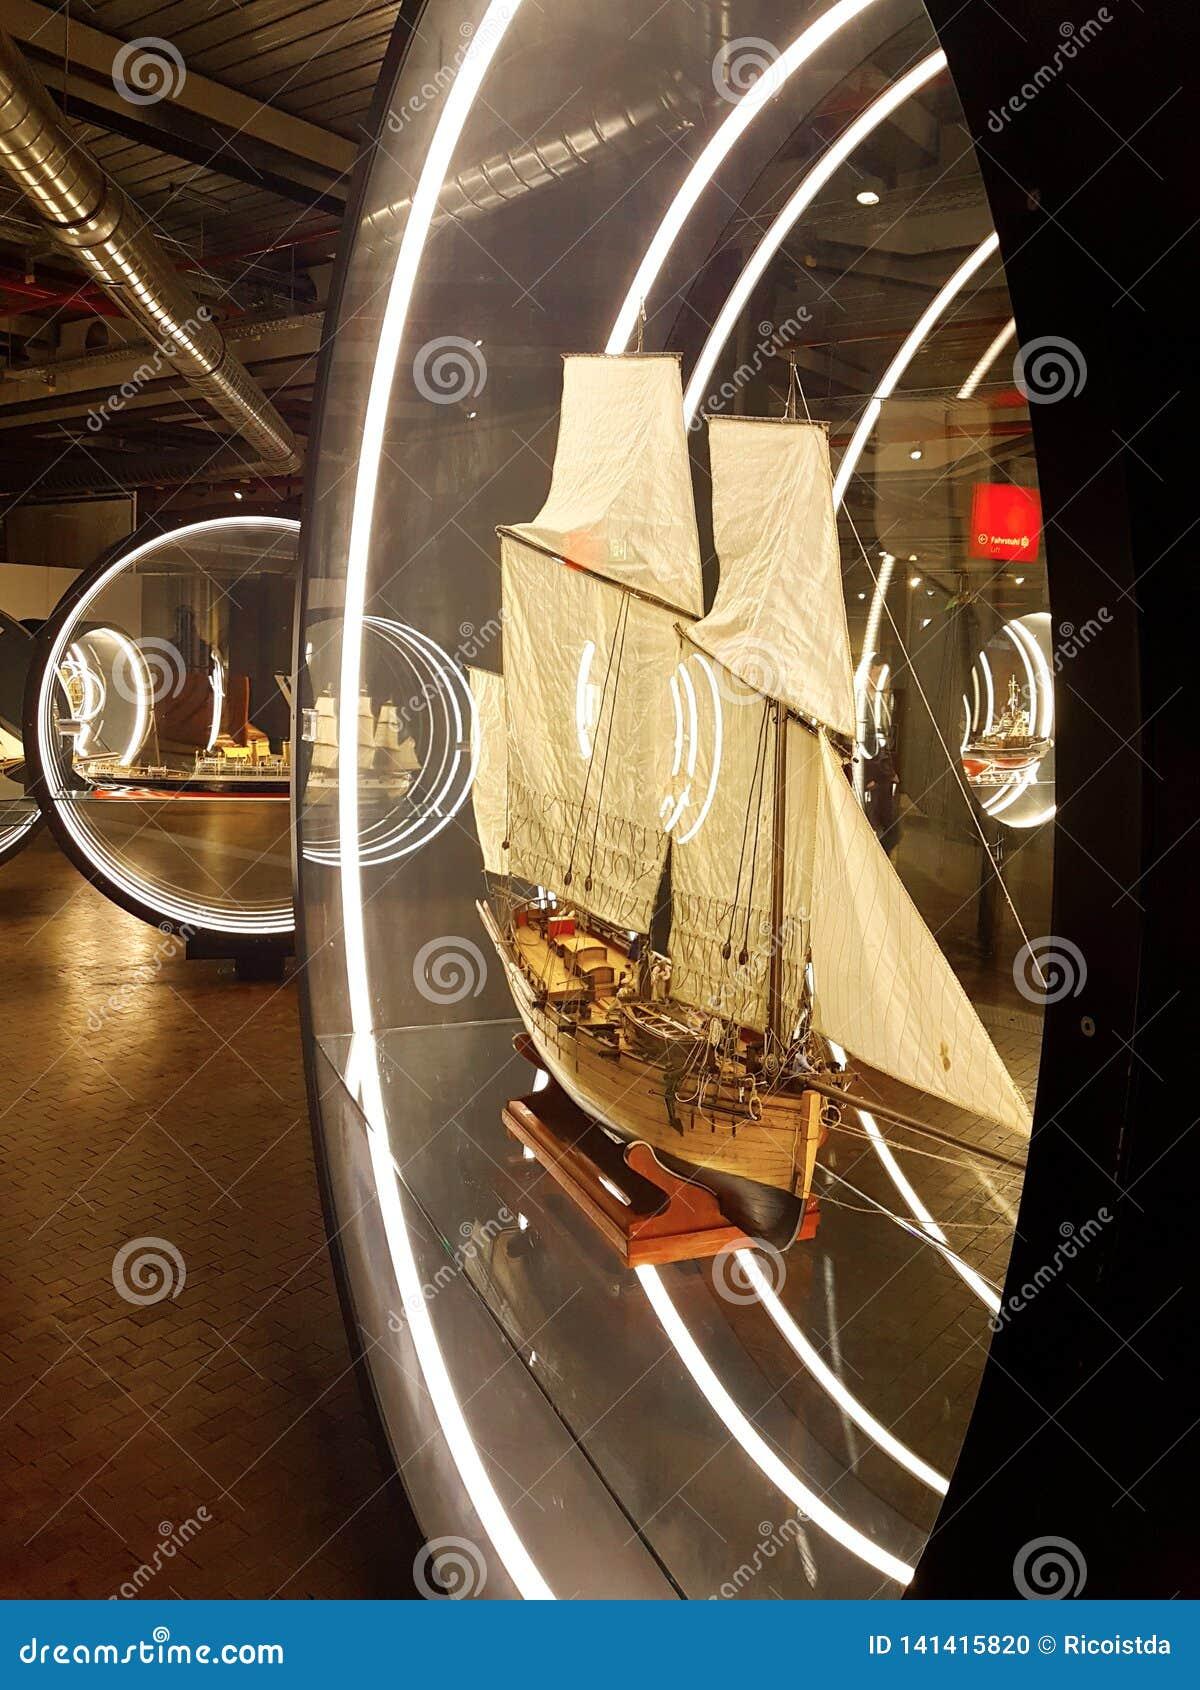 sailship miniature models at naval exhibition